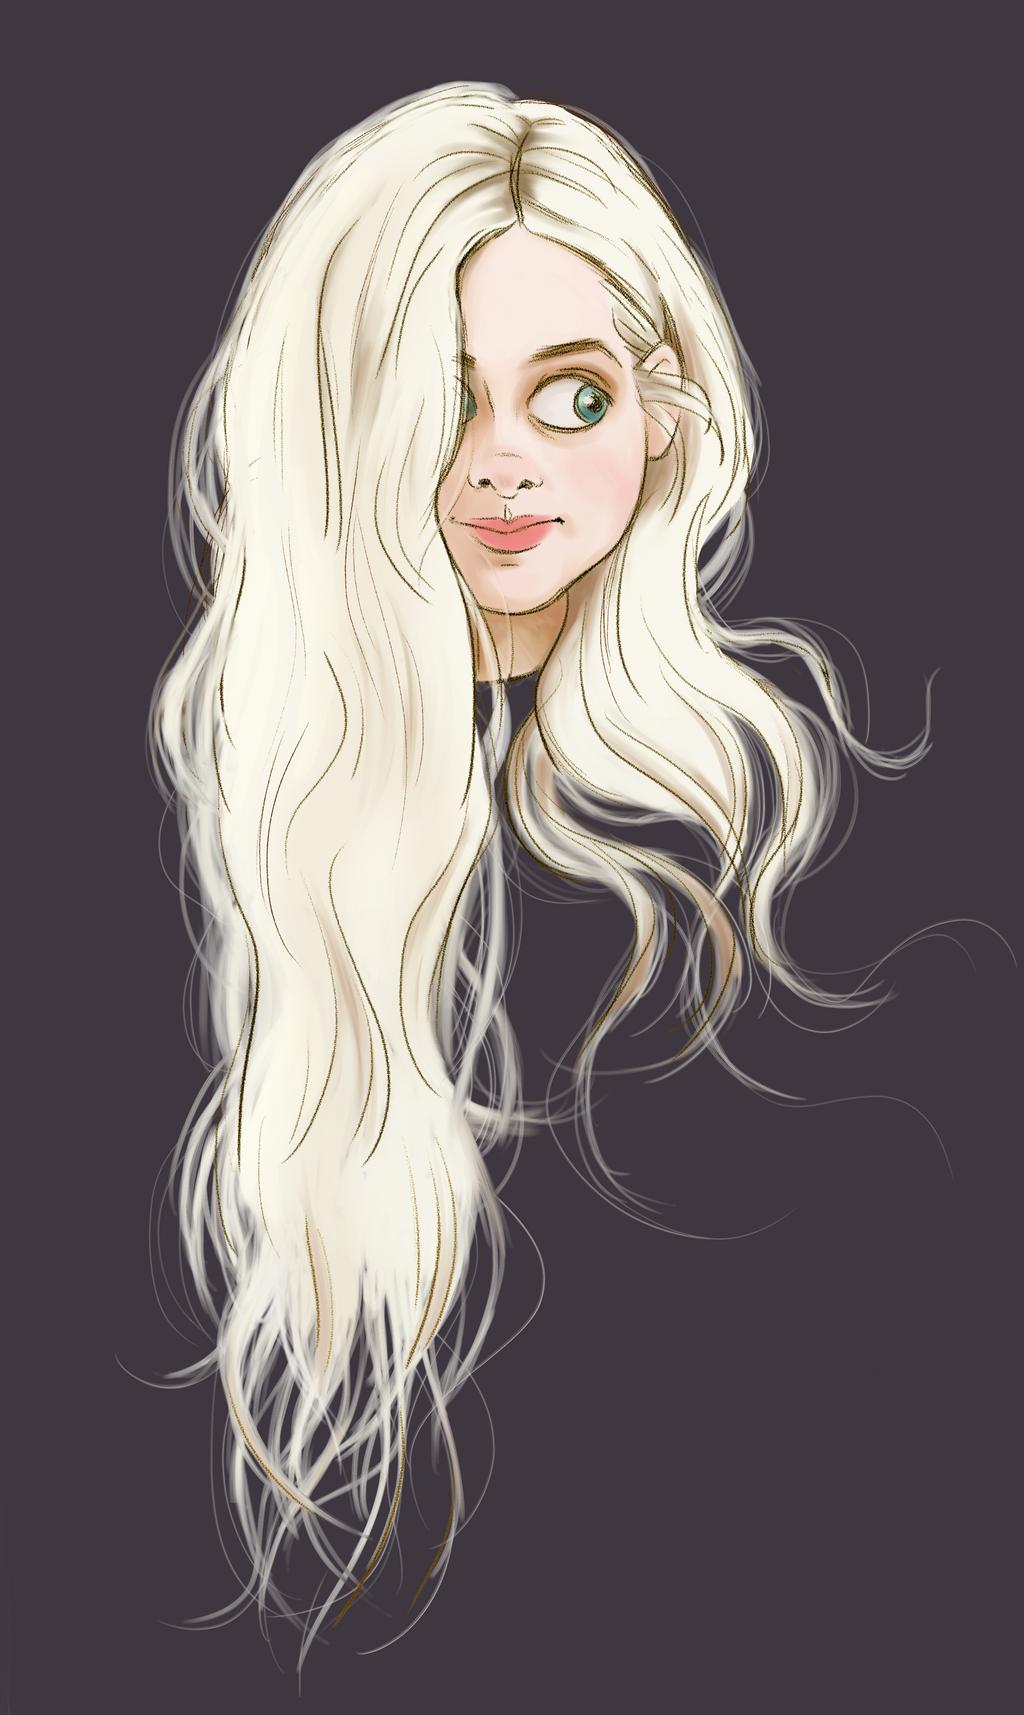 White Hair By DylanBonner On DeviantArt